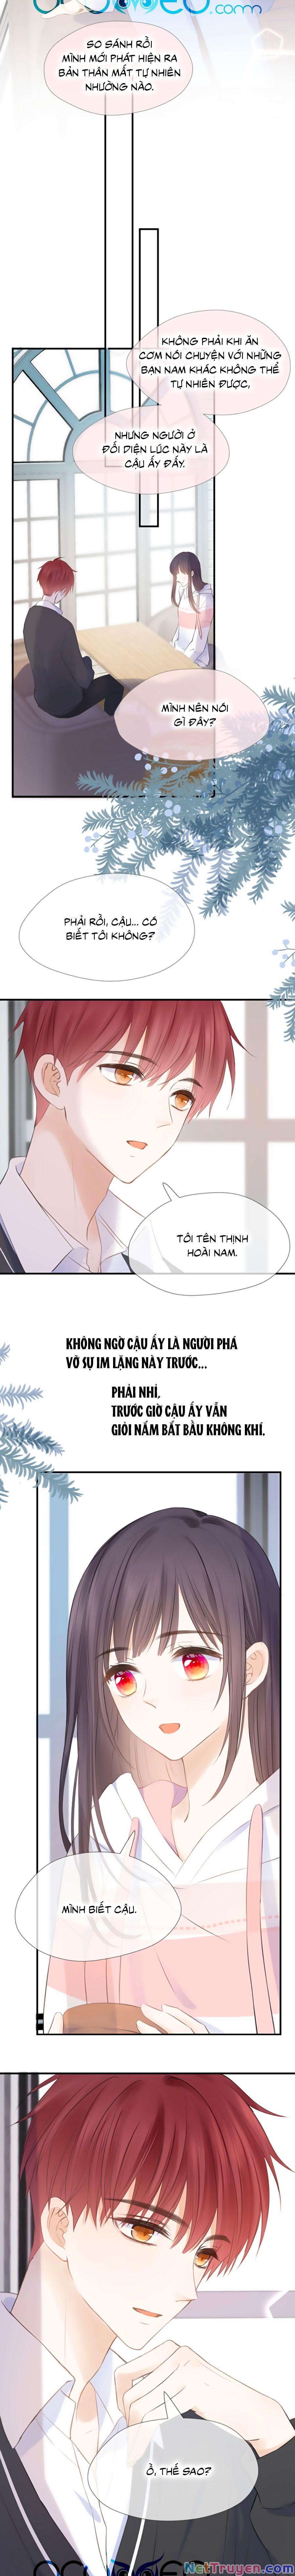 Thầm Yêu: Quất Sinh Hoài Nam Chap 3 . Next Chap Chap 4